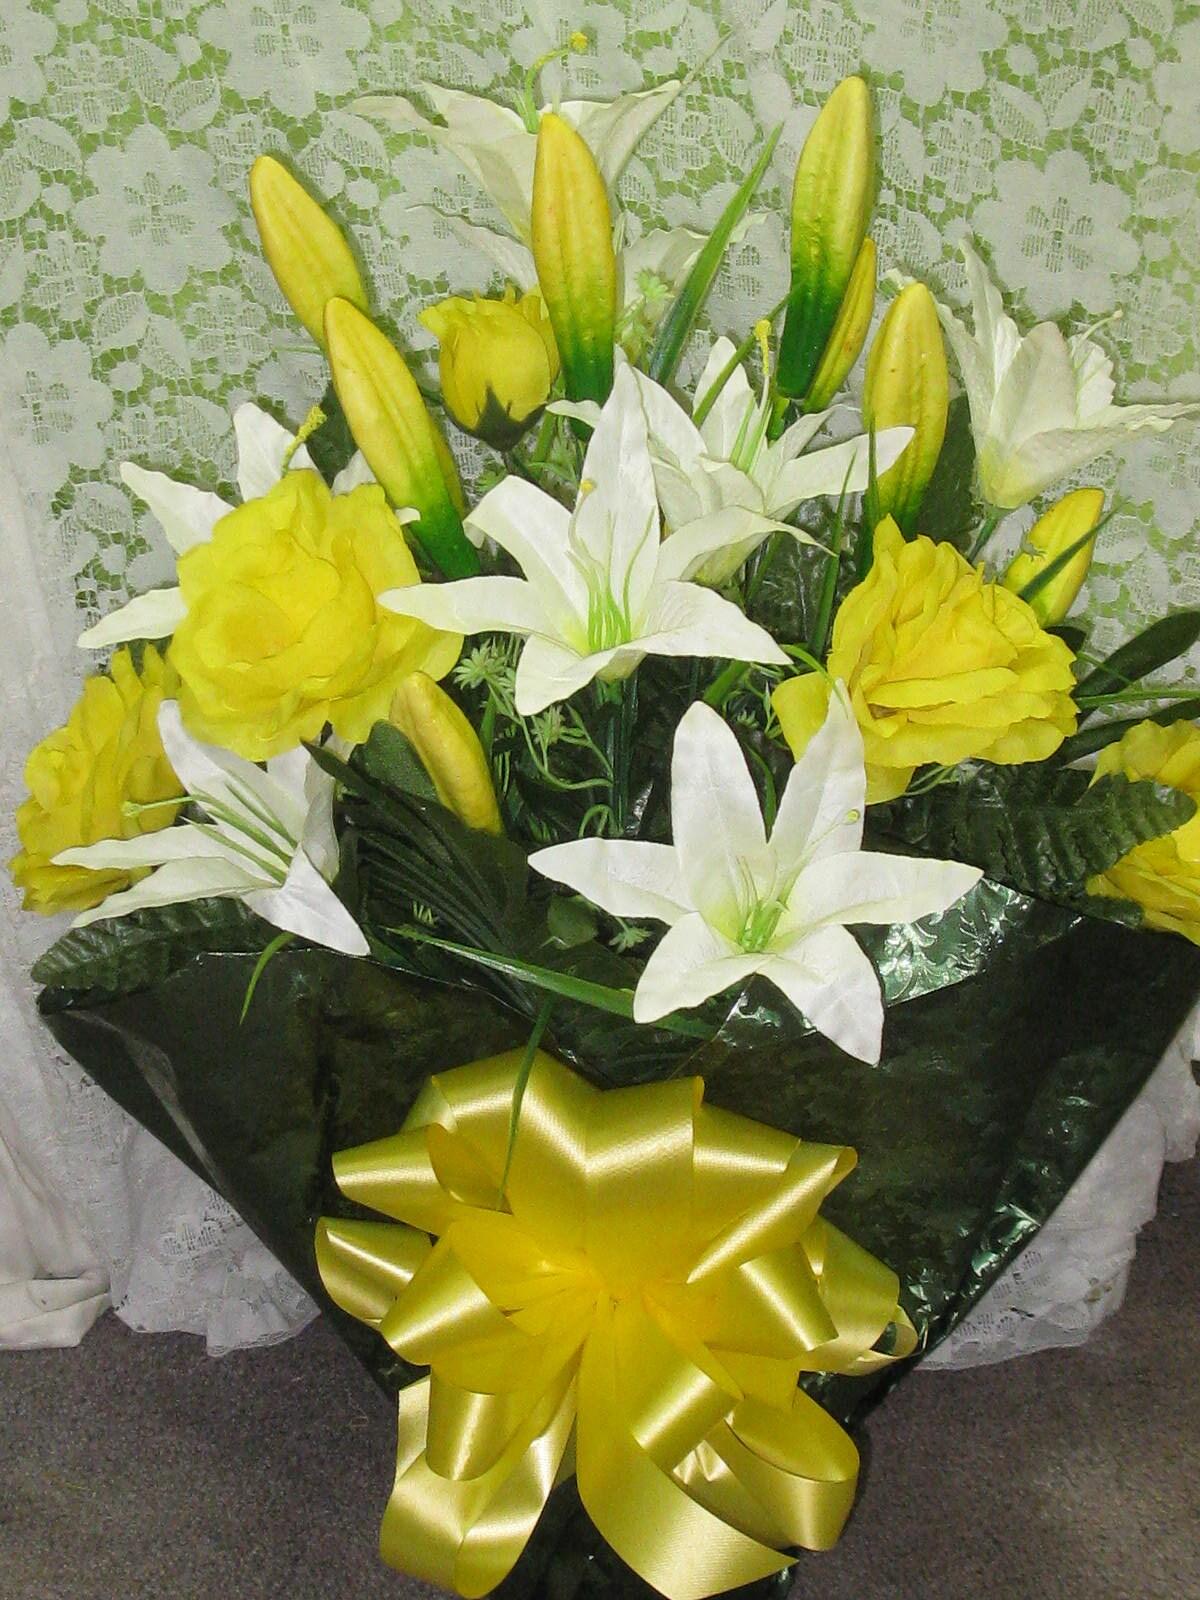 Silk Blumen-Friedhof Abmachung Grab Seidenblume Topf-Memorial | Etsy